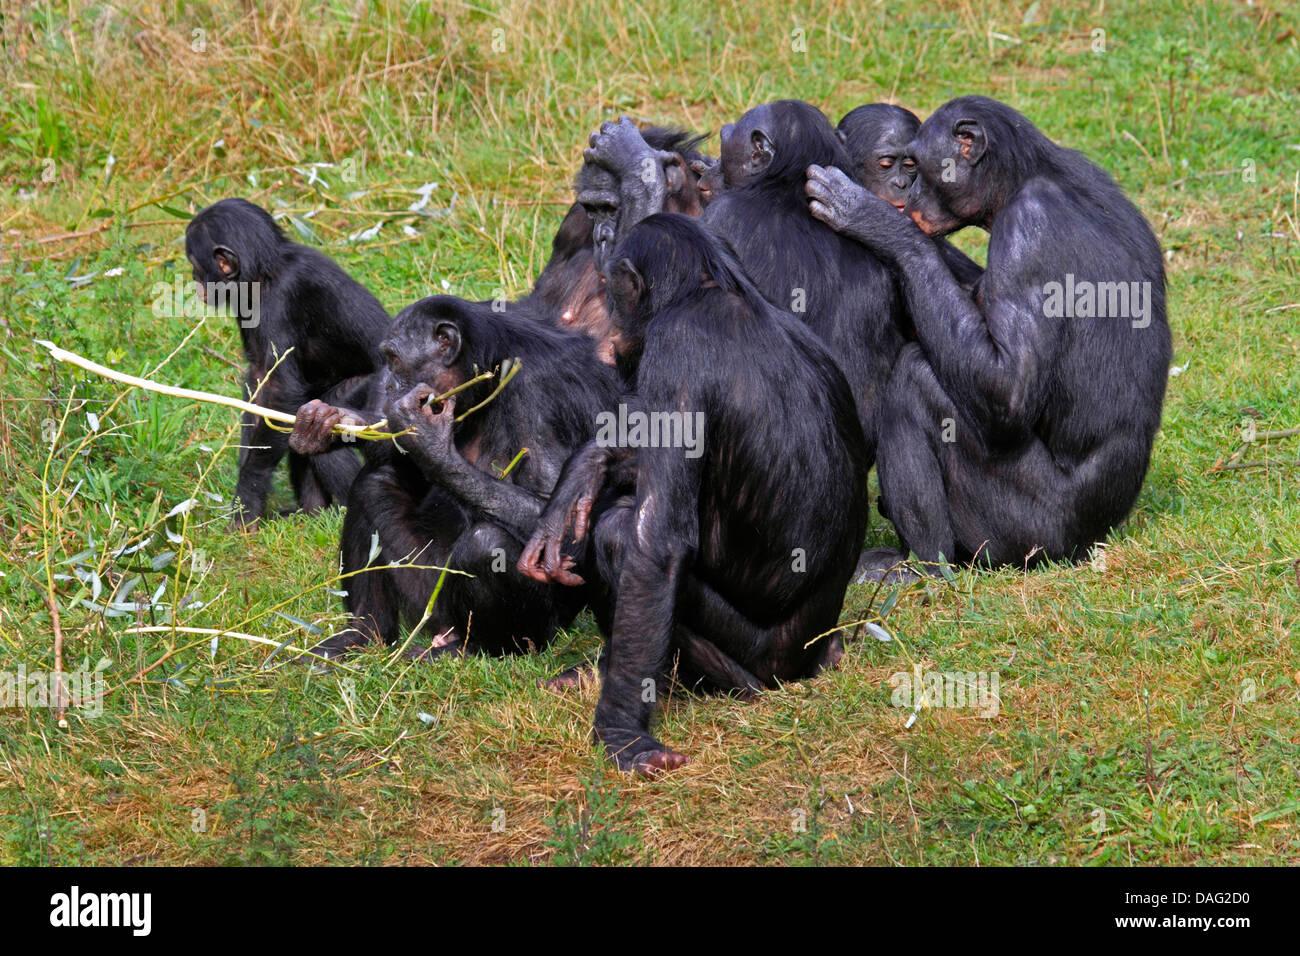 bonobo, pygmy chimpanzee (Pan paniscus), group sitting in a meadow mutually grooming - Stock Image